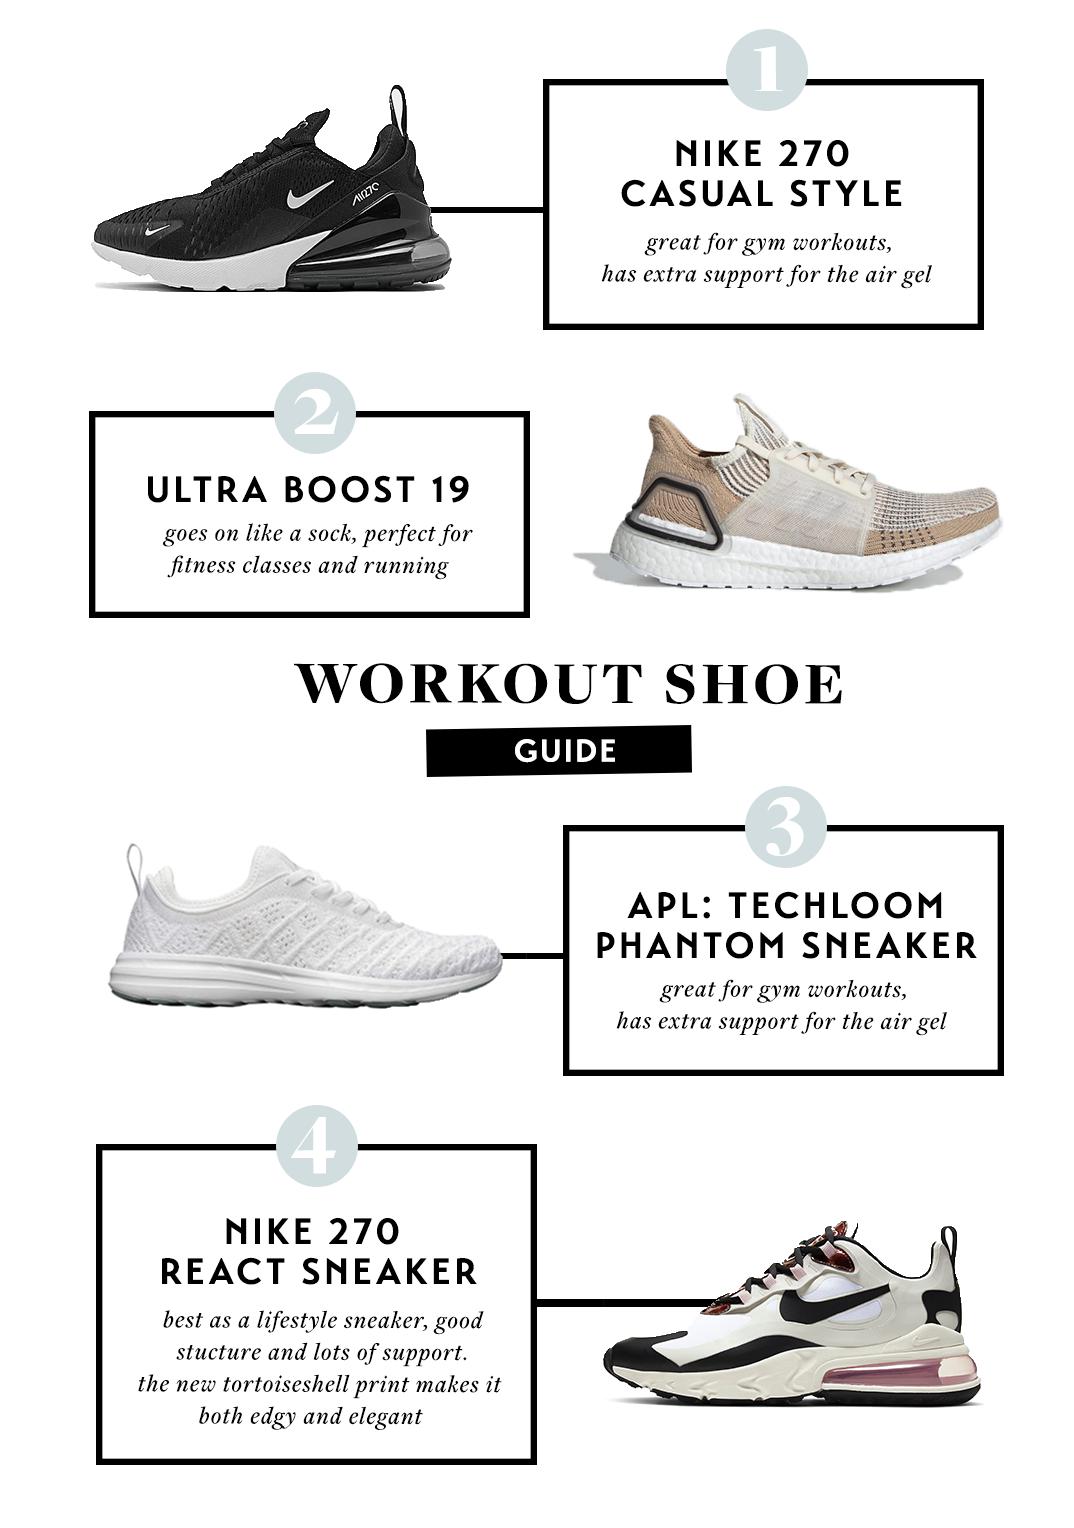 apl workout shoes